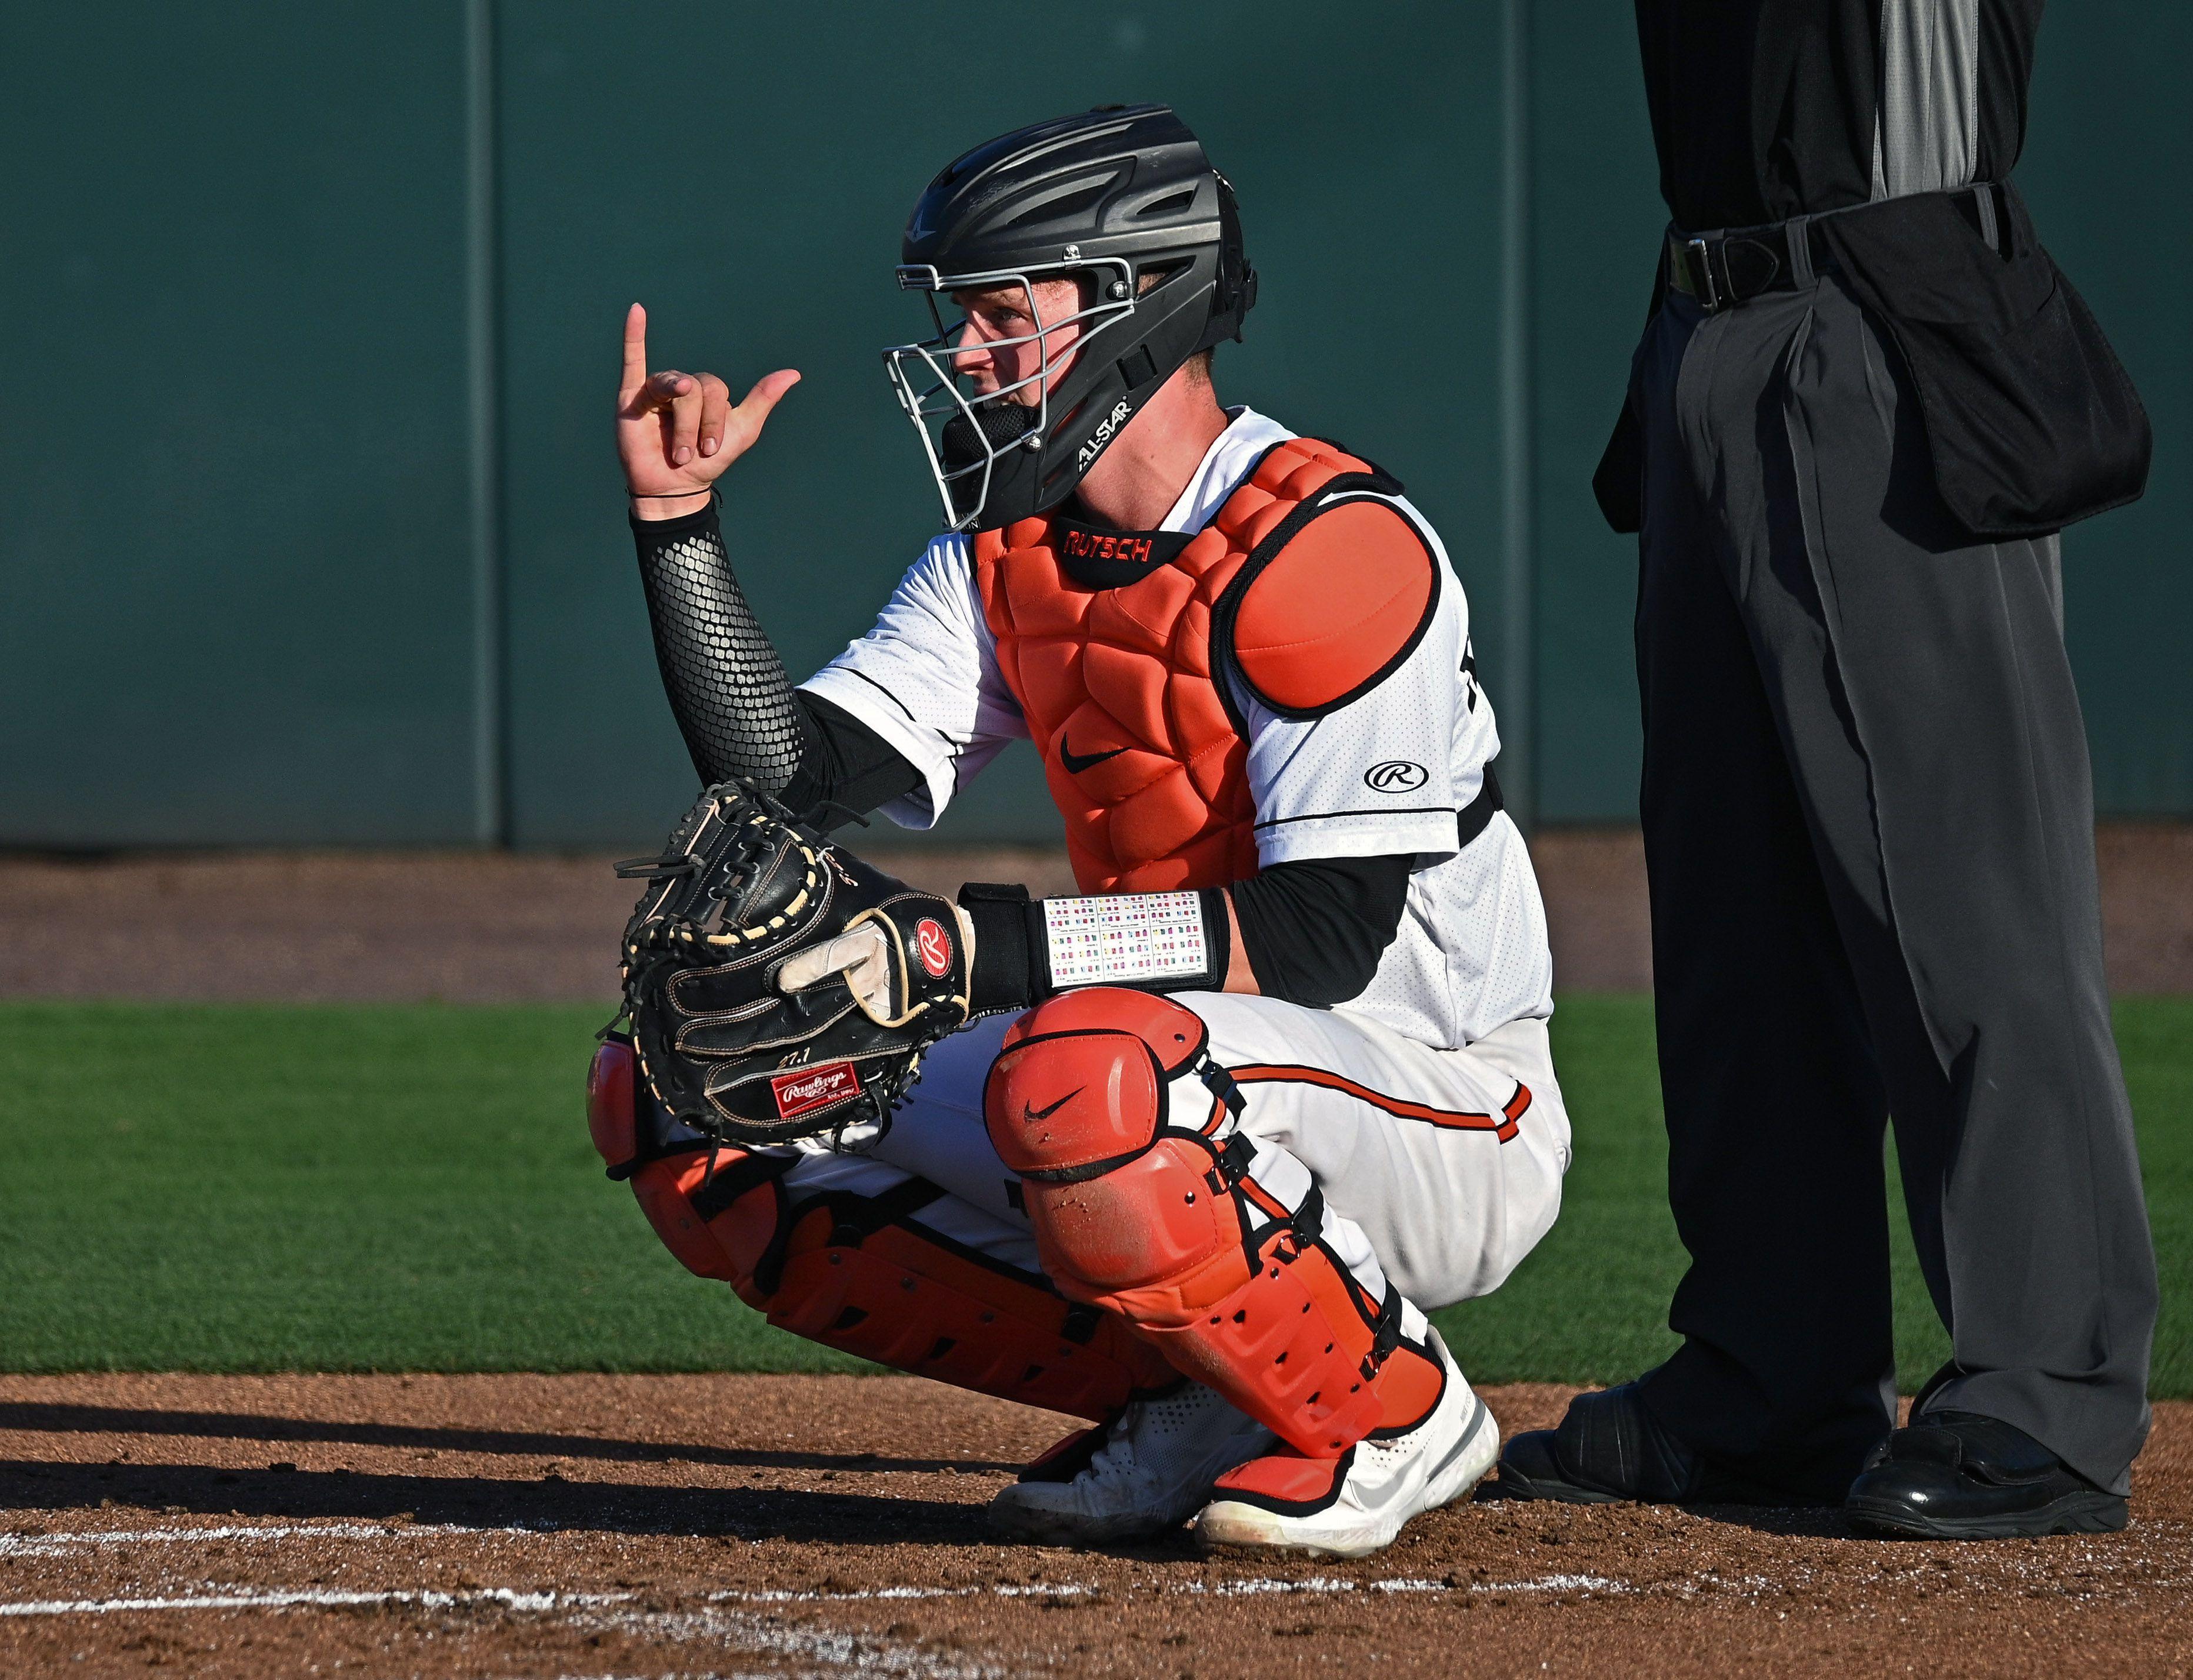 Orioles offseason positional breakdown: At catcher, Adley Rutschman's pending arrival could bring offseason of change